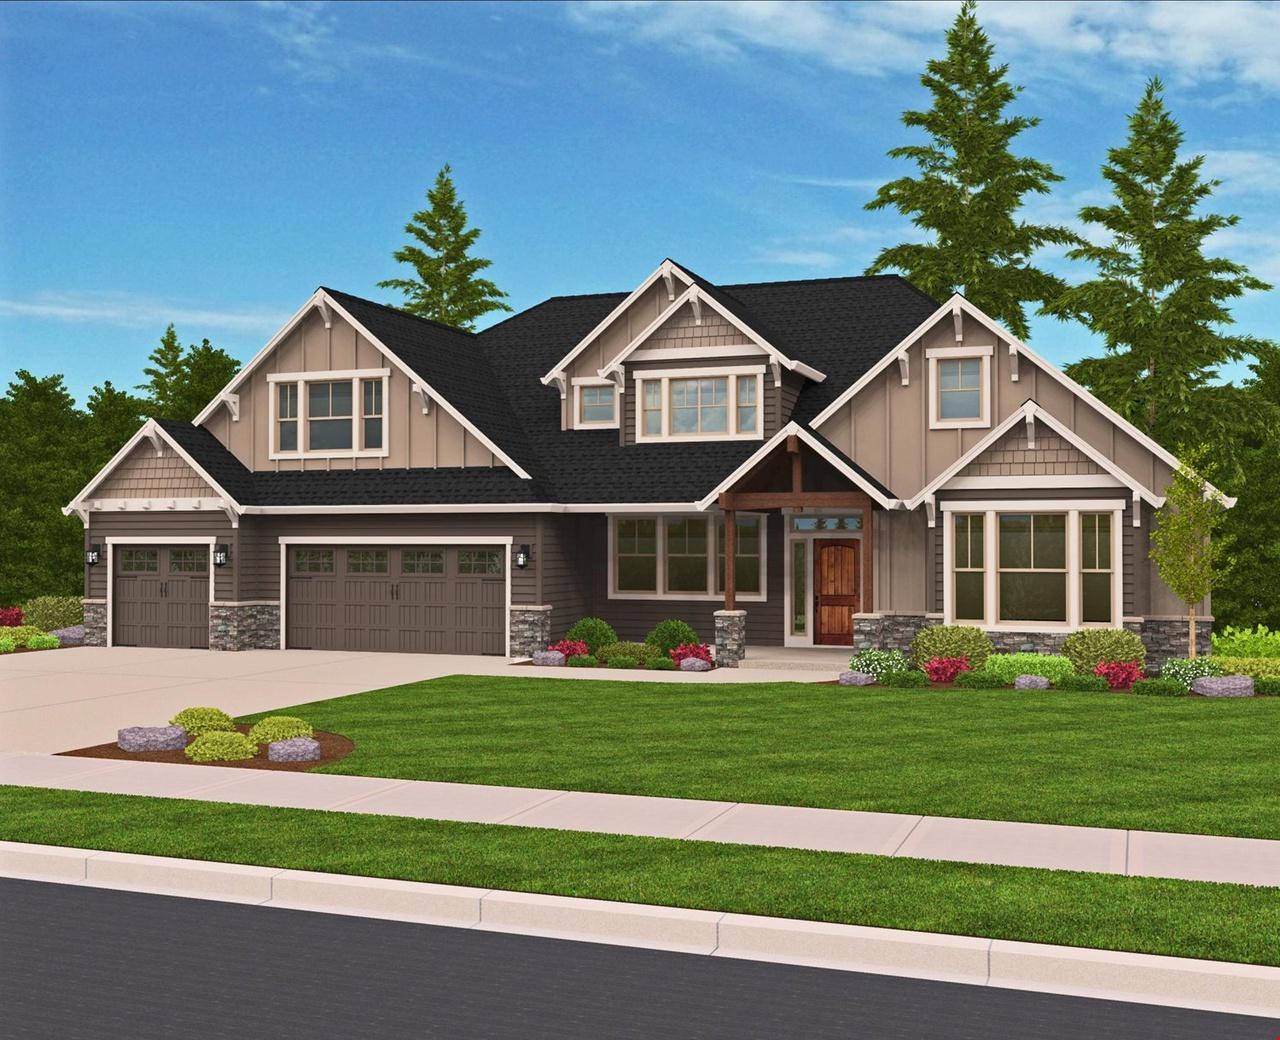 Shasta xxl vancouver wa 98682 758 000 redfin for Custom home builders vancouver wa